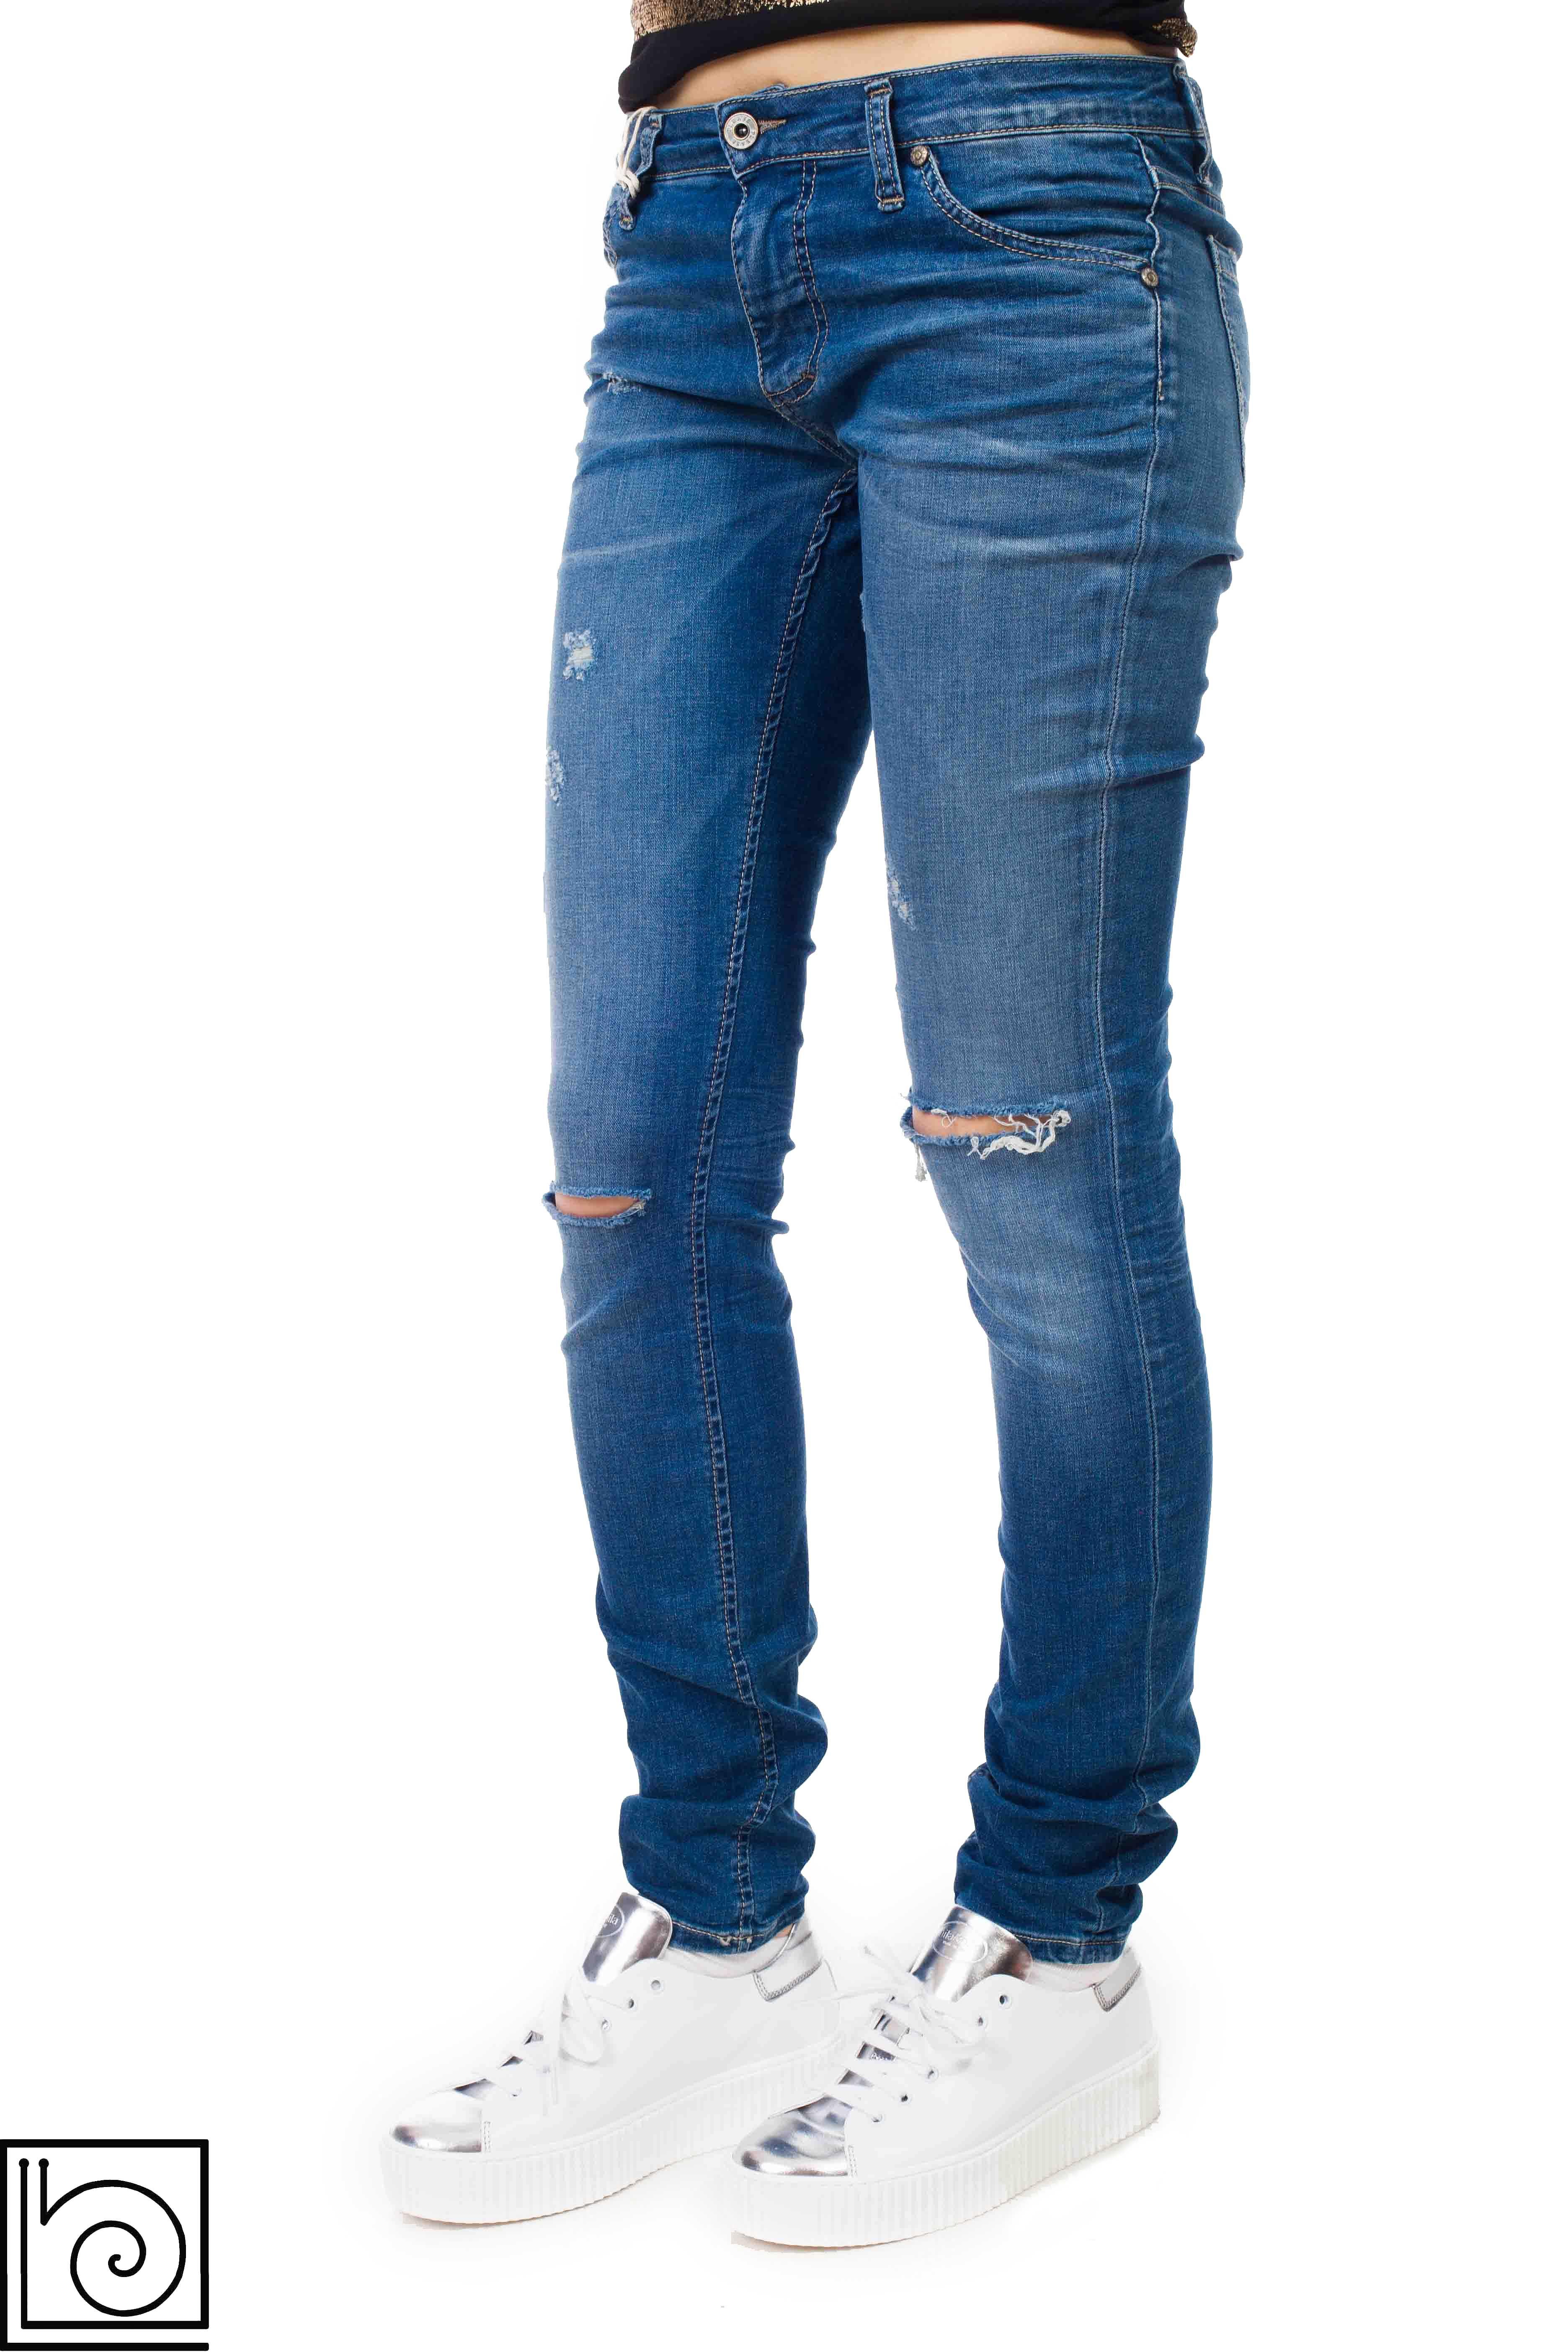 Женские  джинсы Please. http://shopulitka.com/clothes/jeans